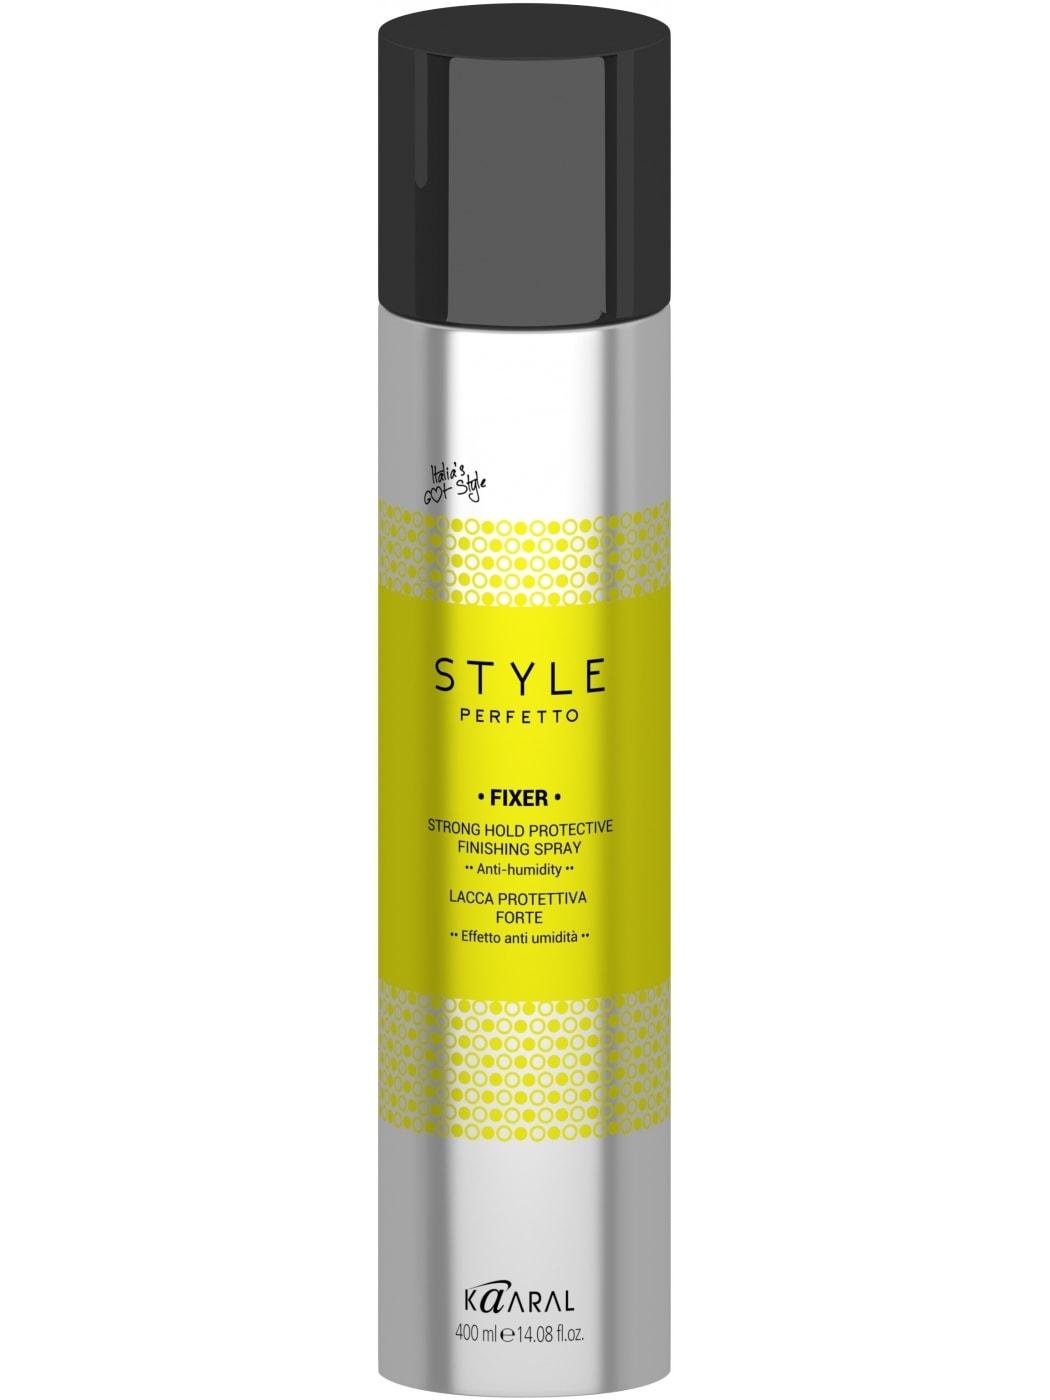 Kaaral Защитный лак для волос сильной фиксации Style Perfetto Fixer Strong Hold Protective Finishing Spray, 400 мл  недорого